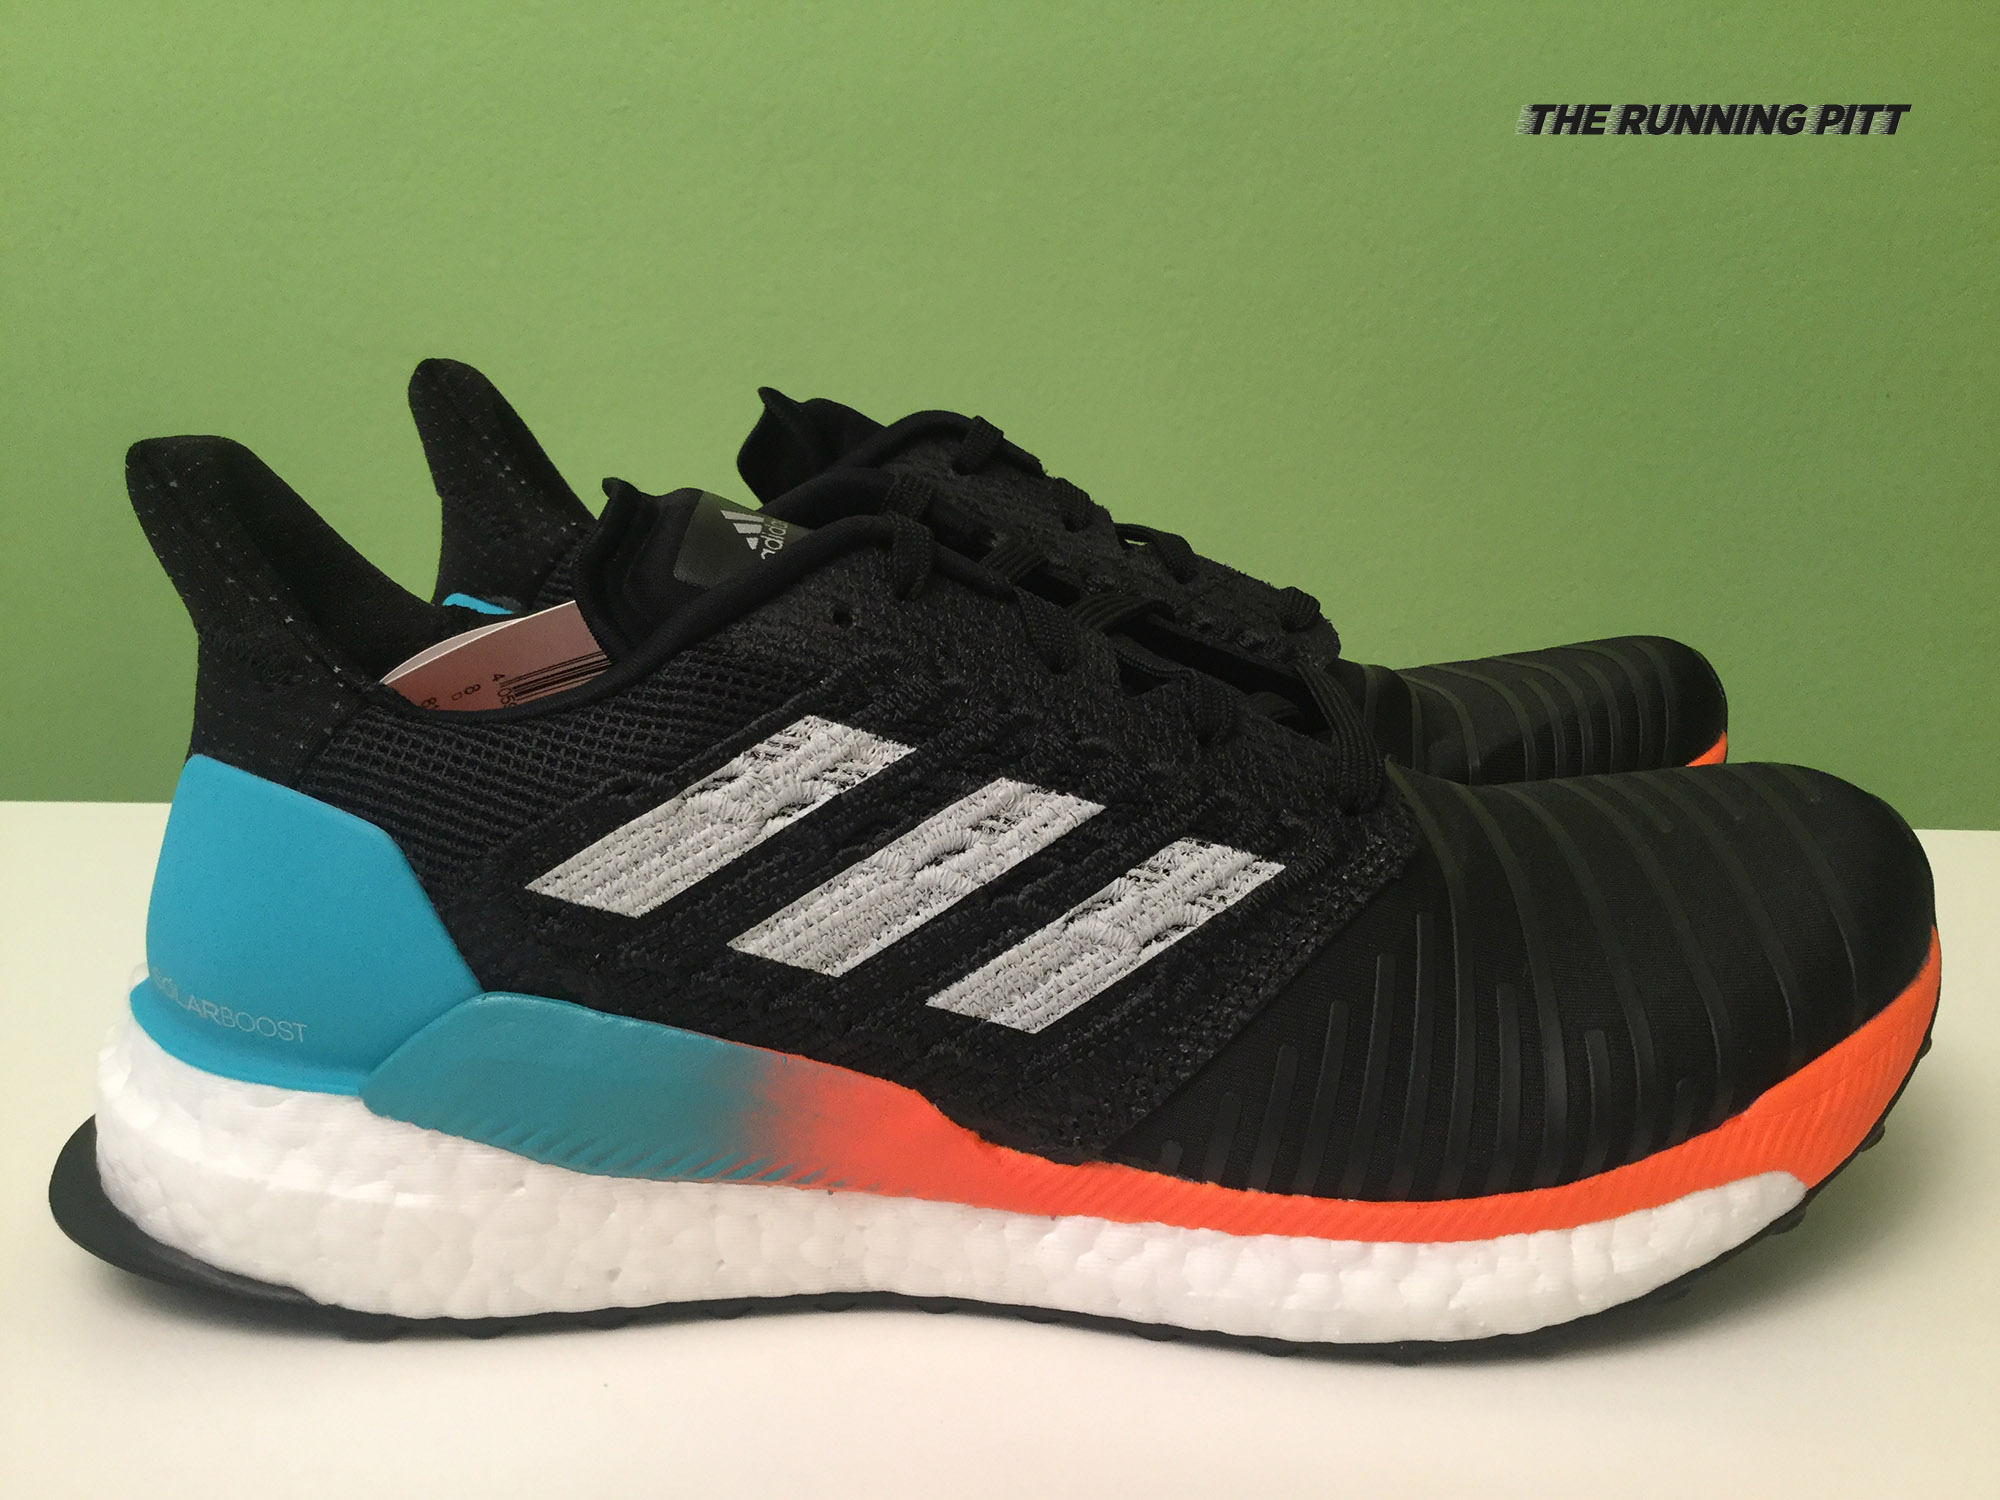 wholesale dealer ada78 3f490 Scarpa neutra Adidas Solar Boost